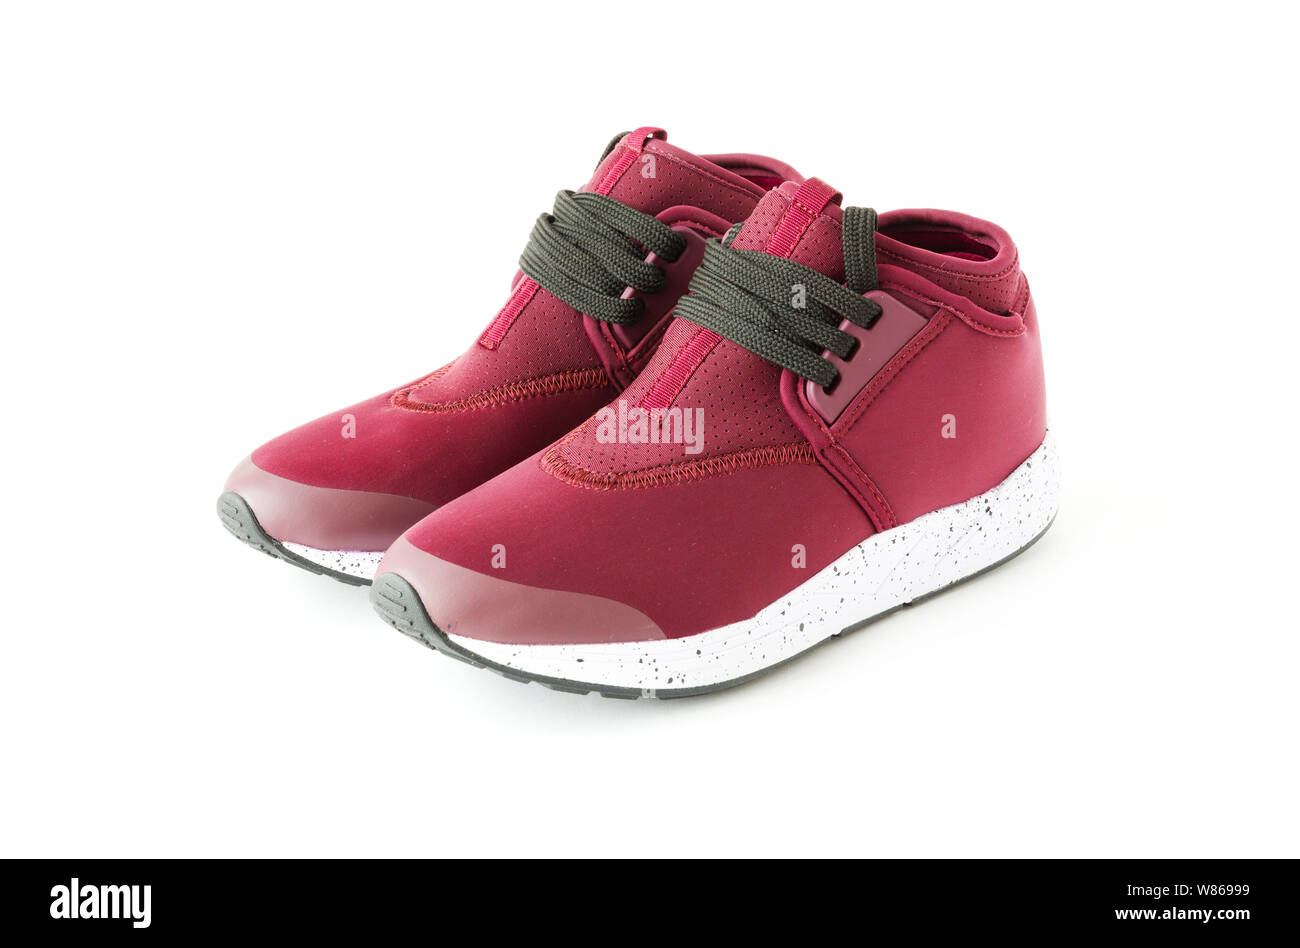 isolated unisex modern style jogging shoes Stock Photo